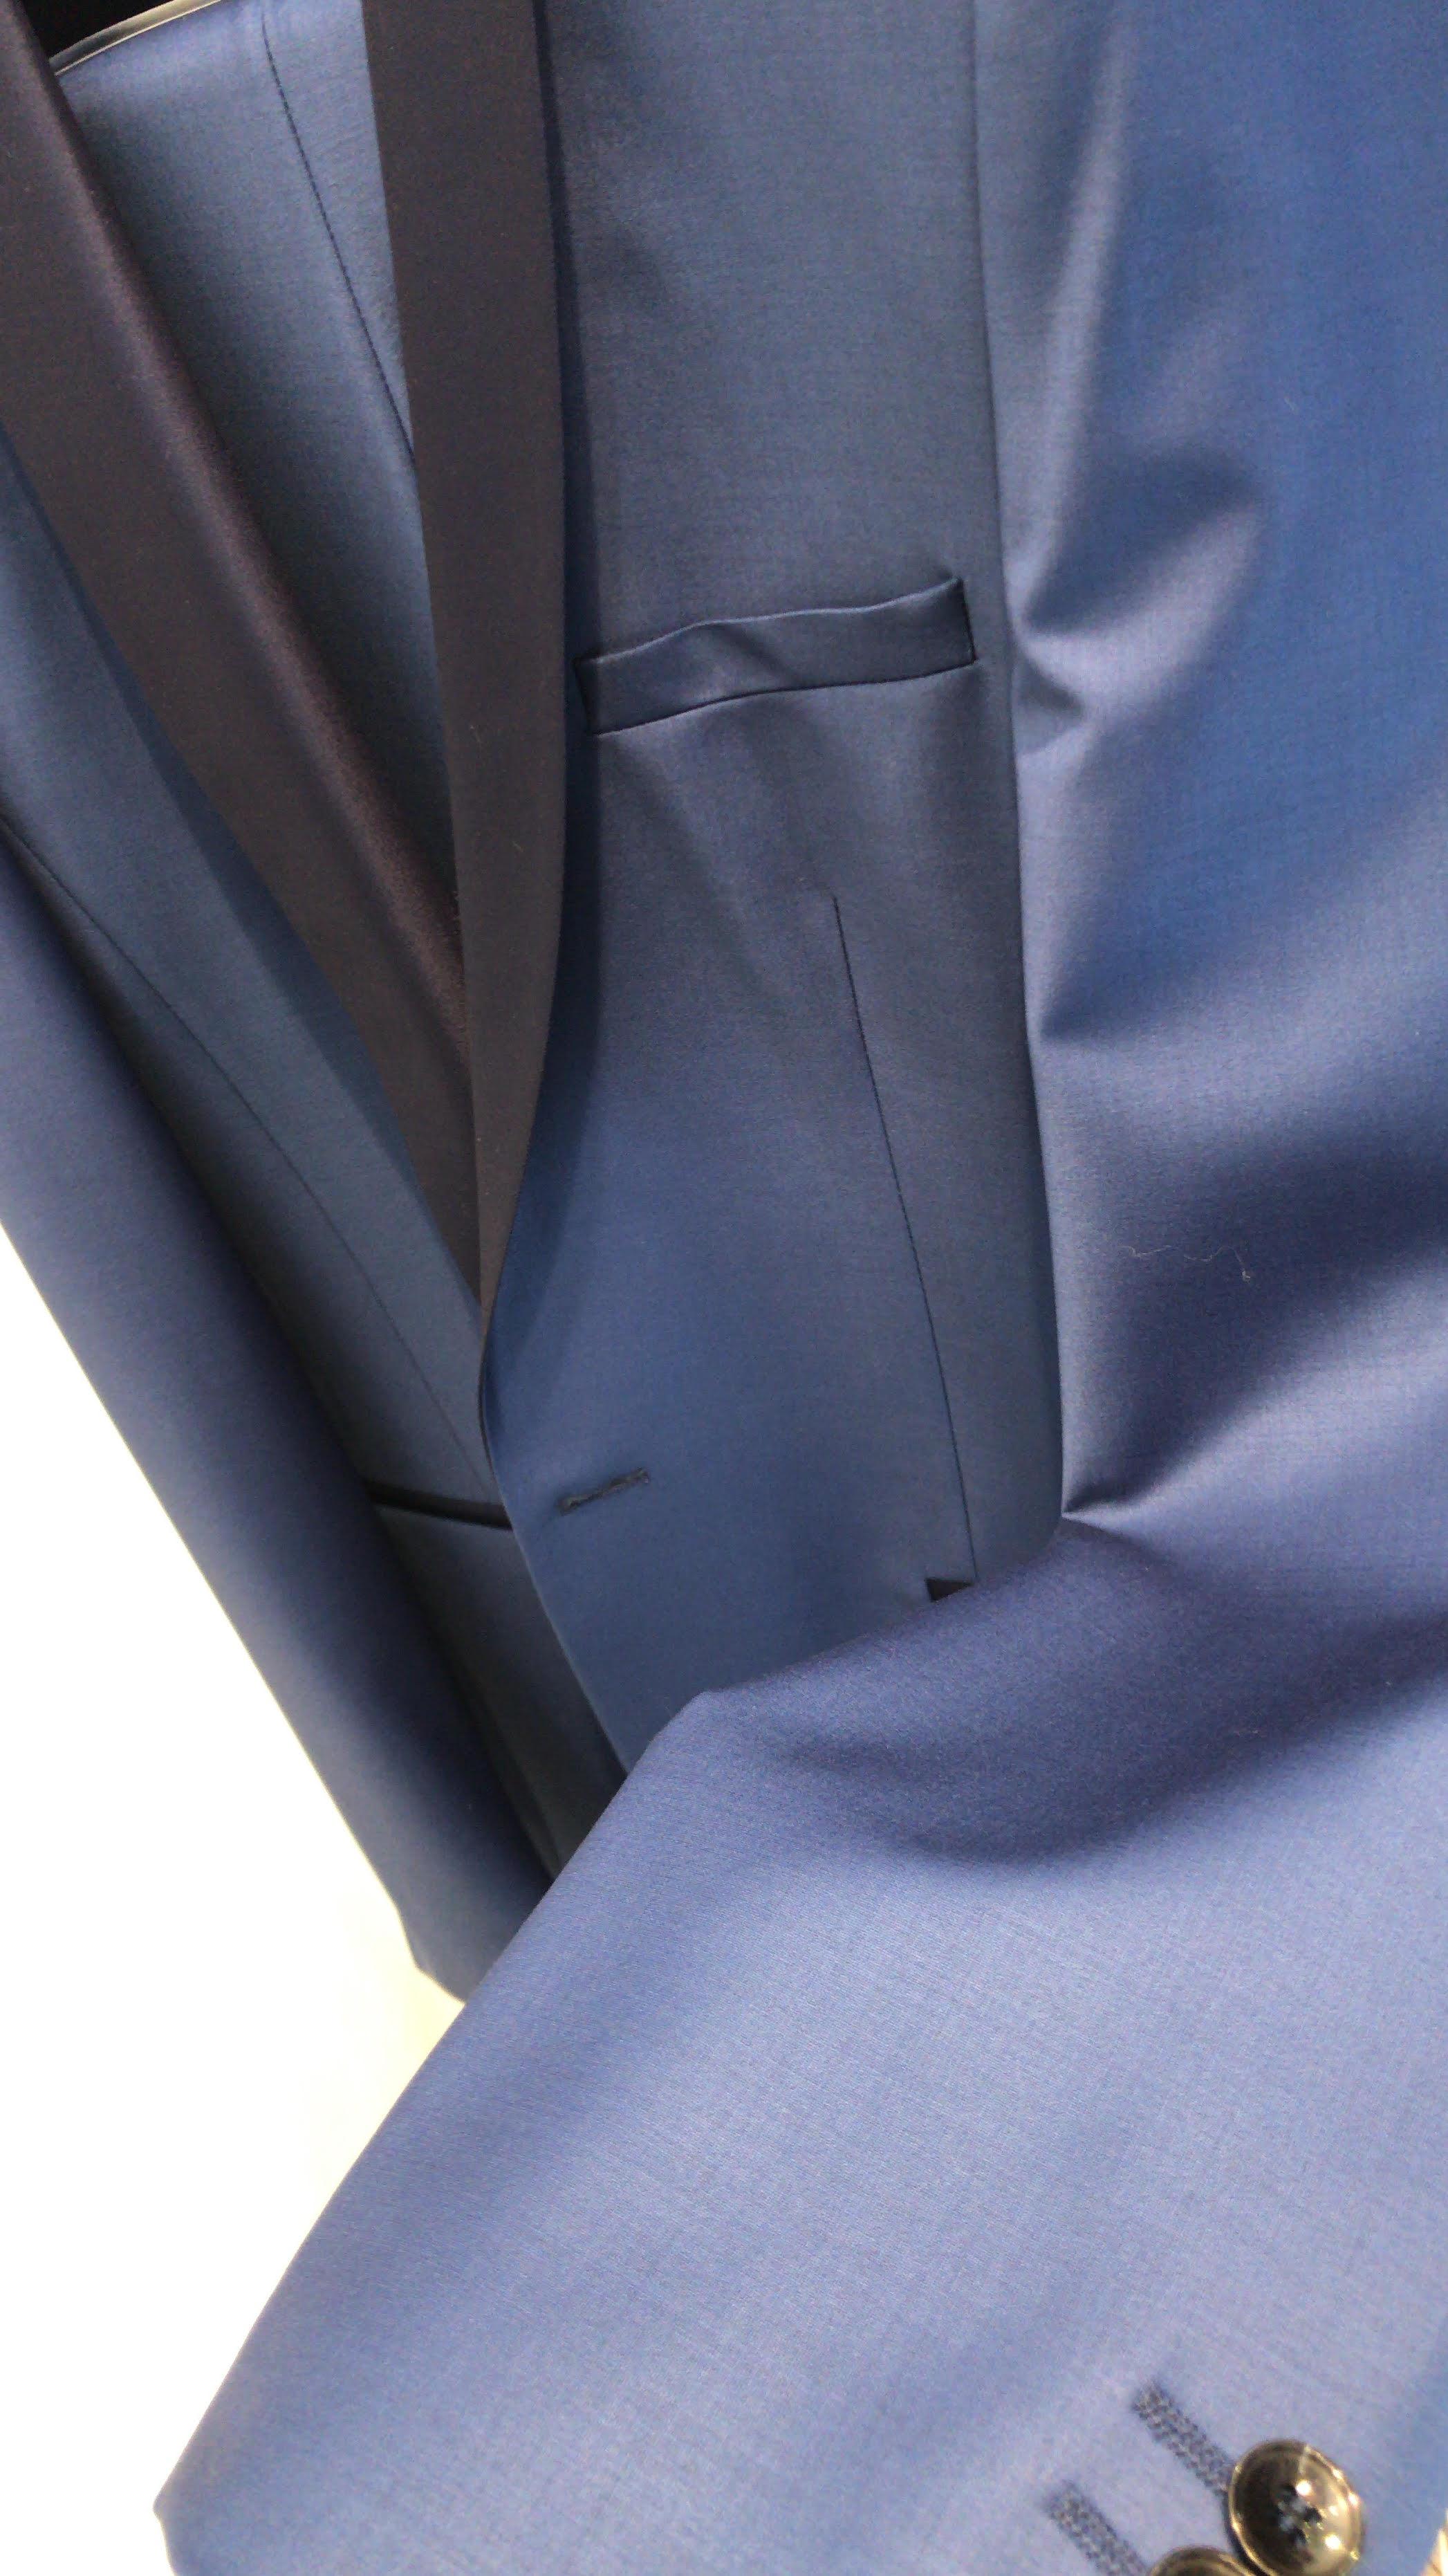 Smoking bleu Roi col châle bleu marine, Gianni Ferrucci - Gianni ... 8dfd9f5a047